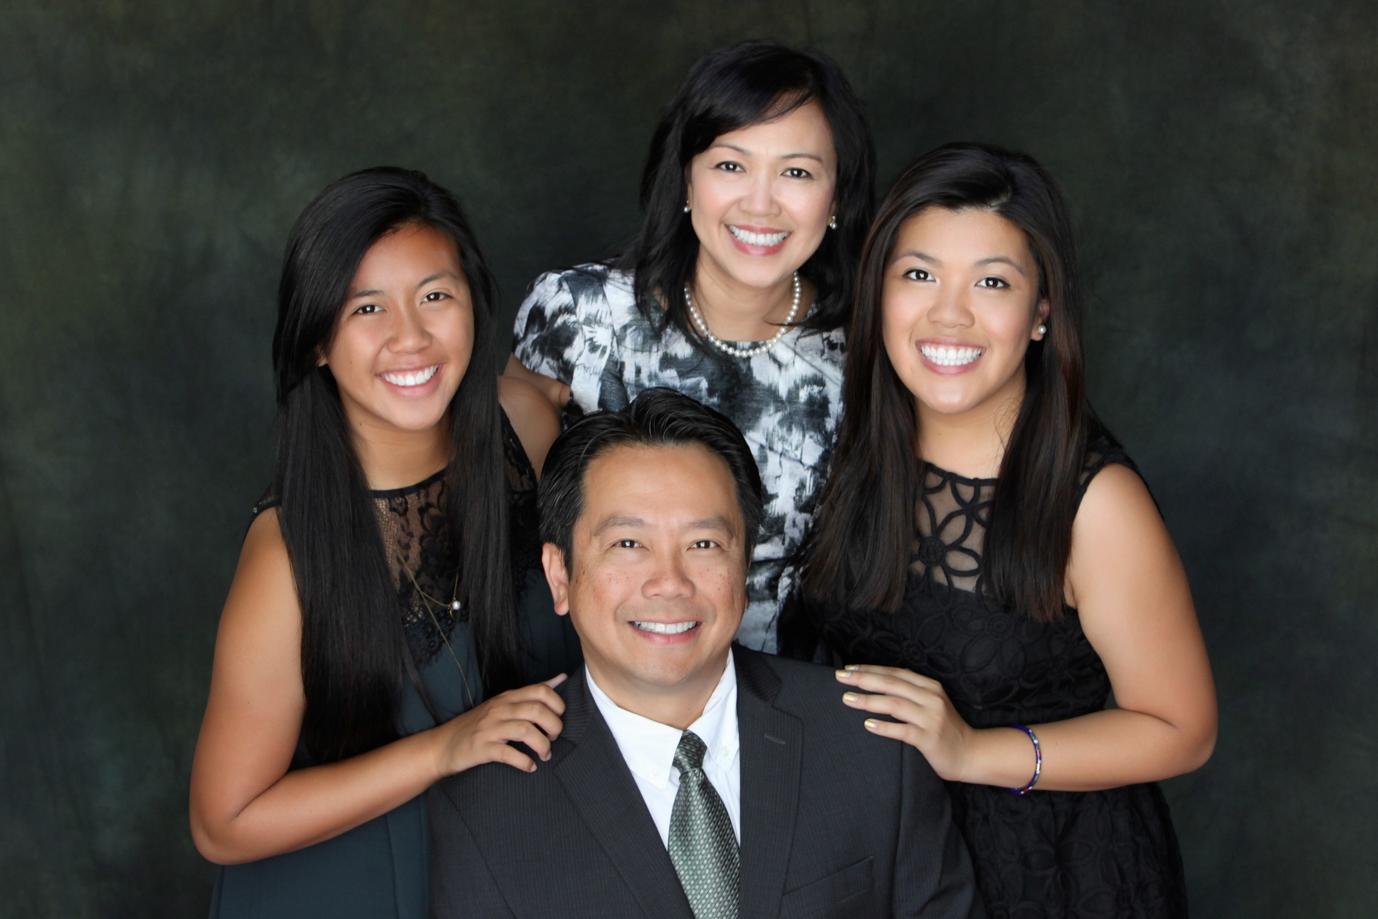 Aliso Viejo, California Family Portrait Photography